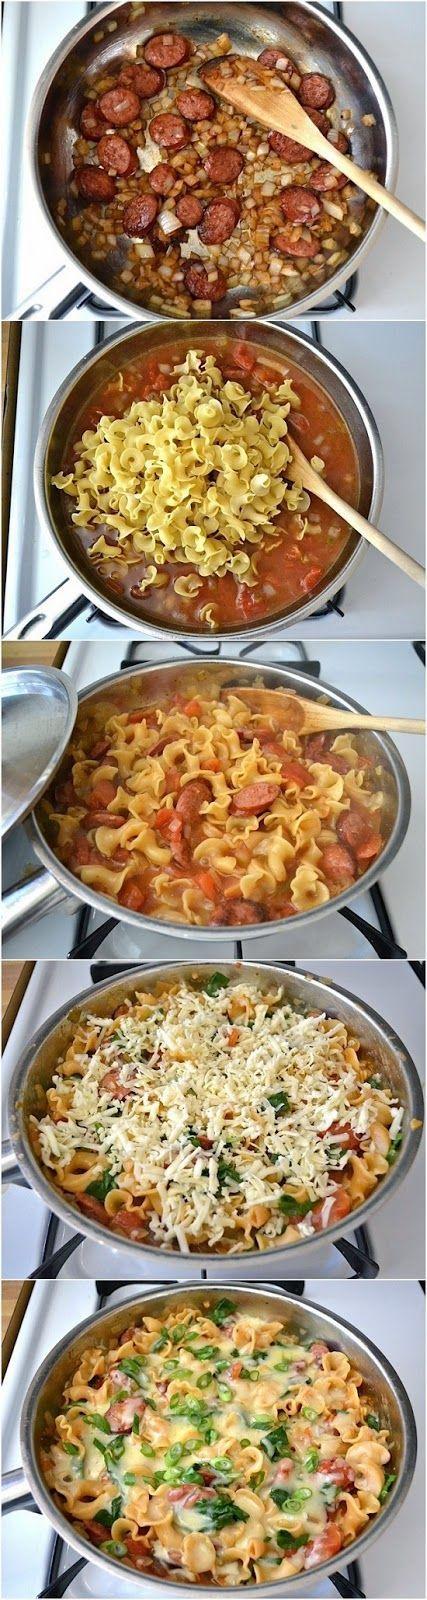 Creamy Sausage and Spinach Pasta Skillet - firstyum